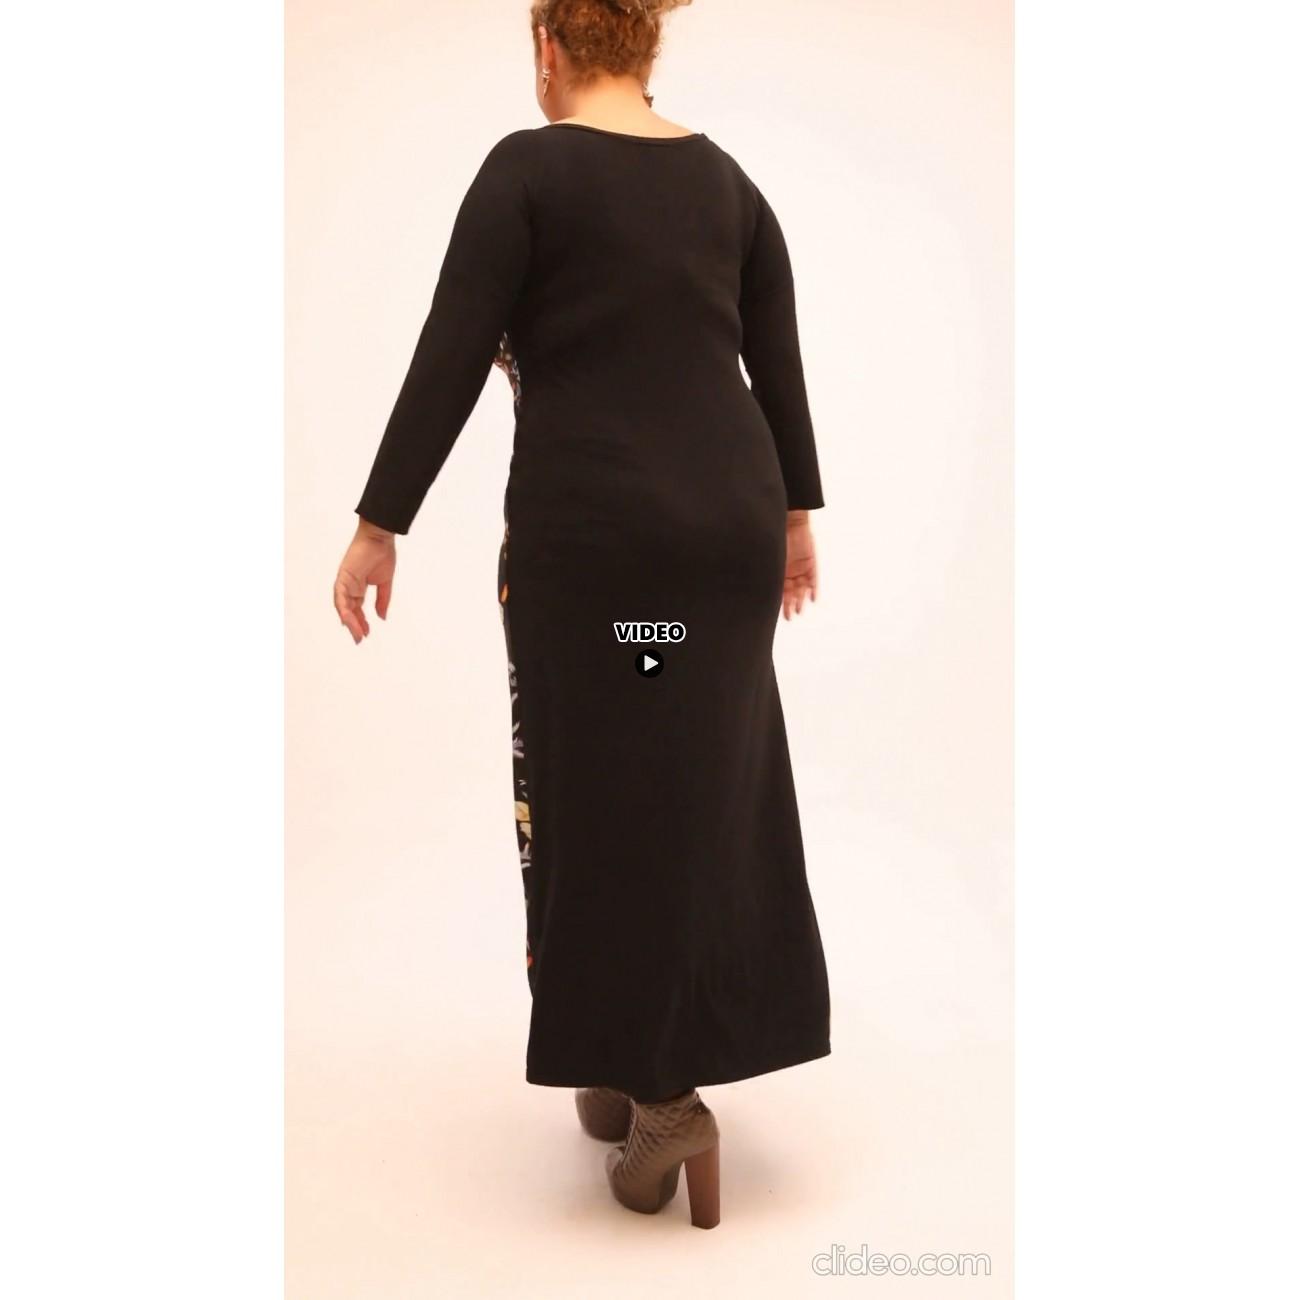 B21-7723FK Long dress with pattern